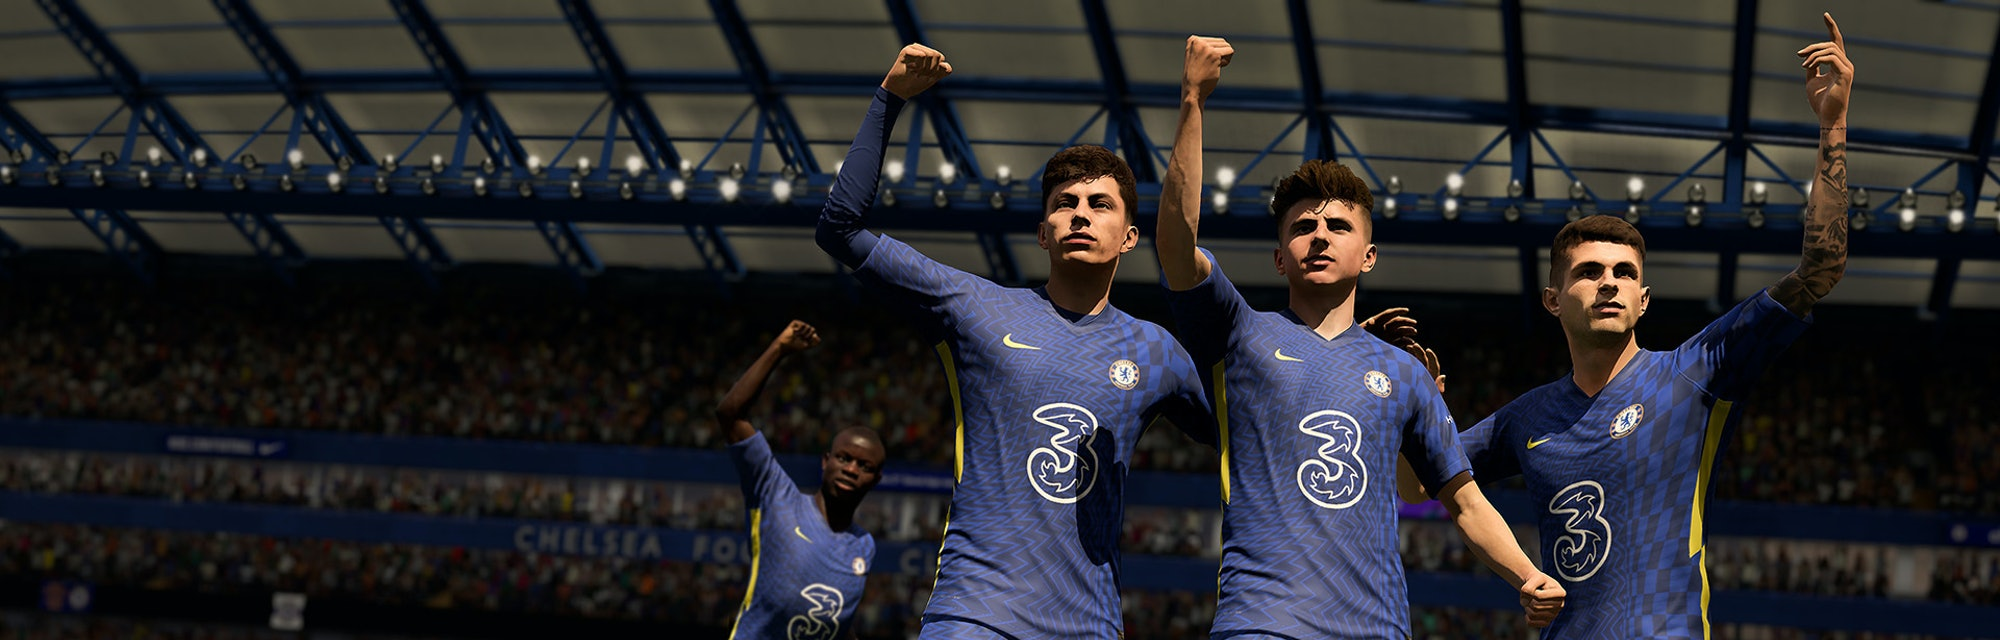 fifa 22 title update 1 team